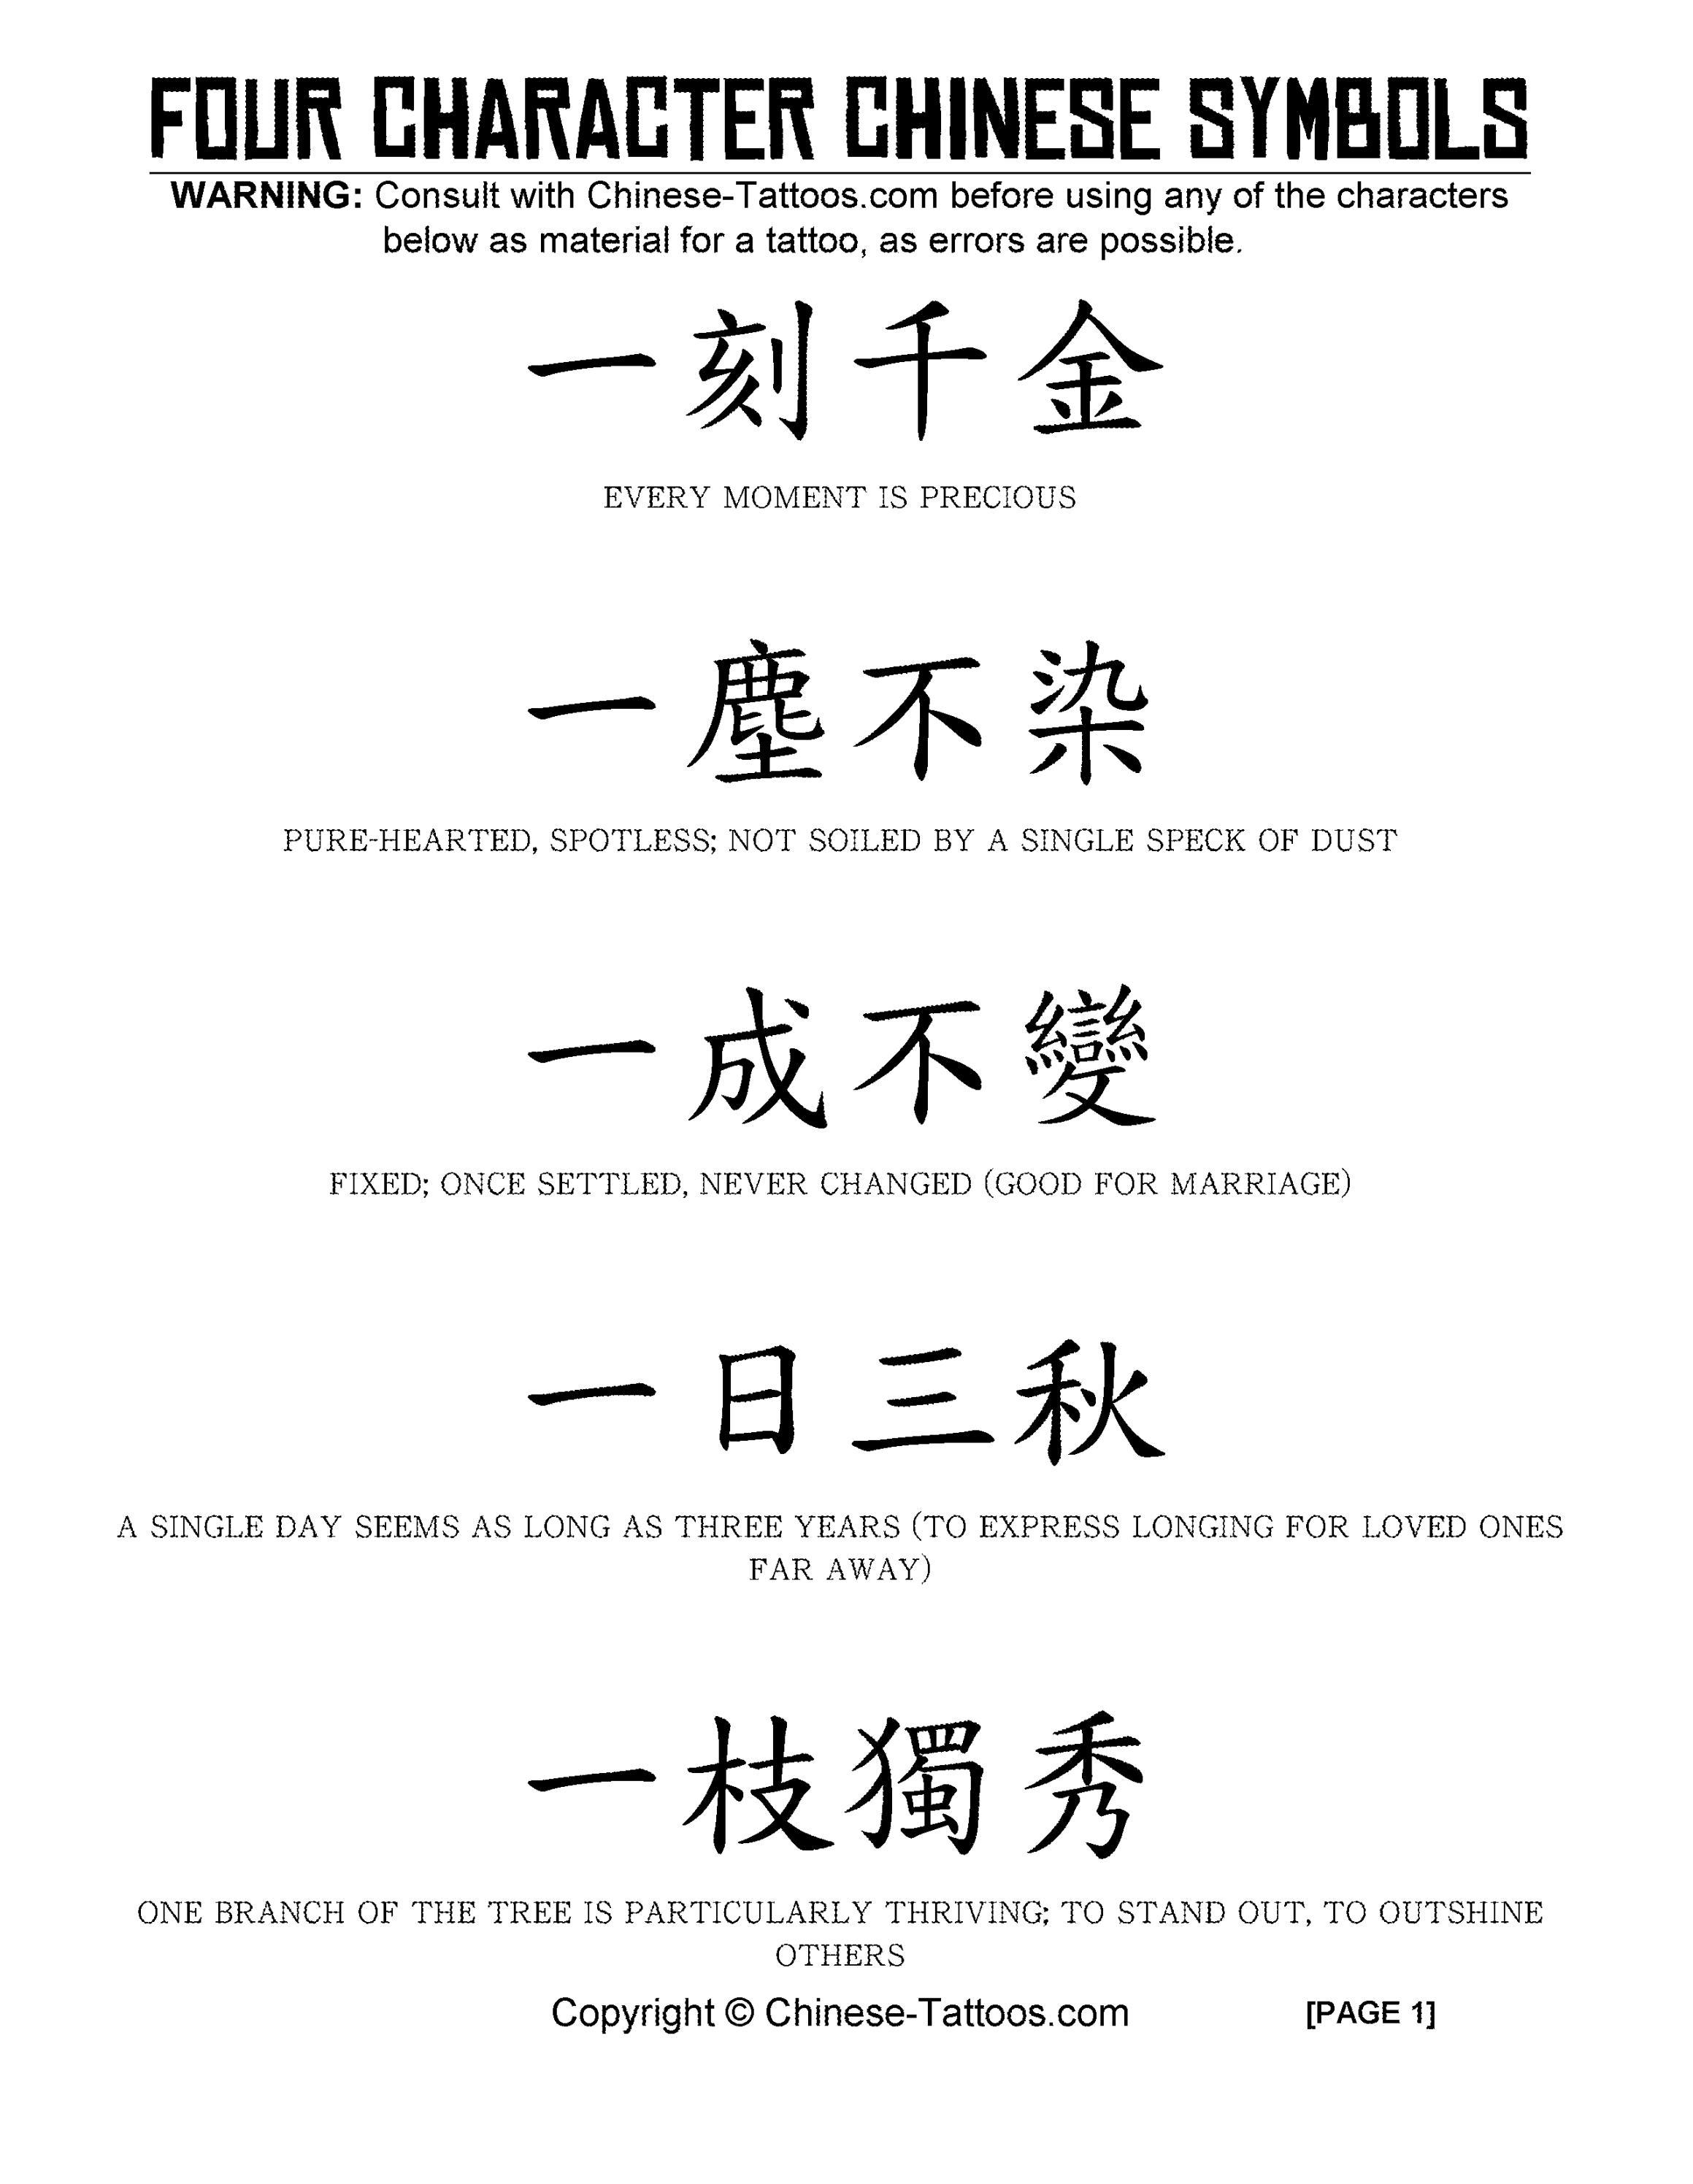 Chinese tattoos 4 character symbols by chinese tattoos issuu buycottarizona Gallery